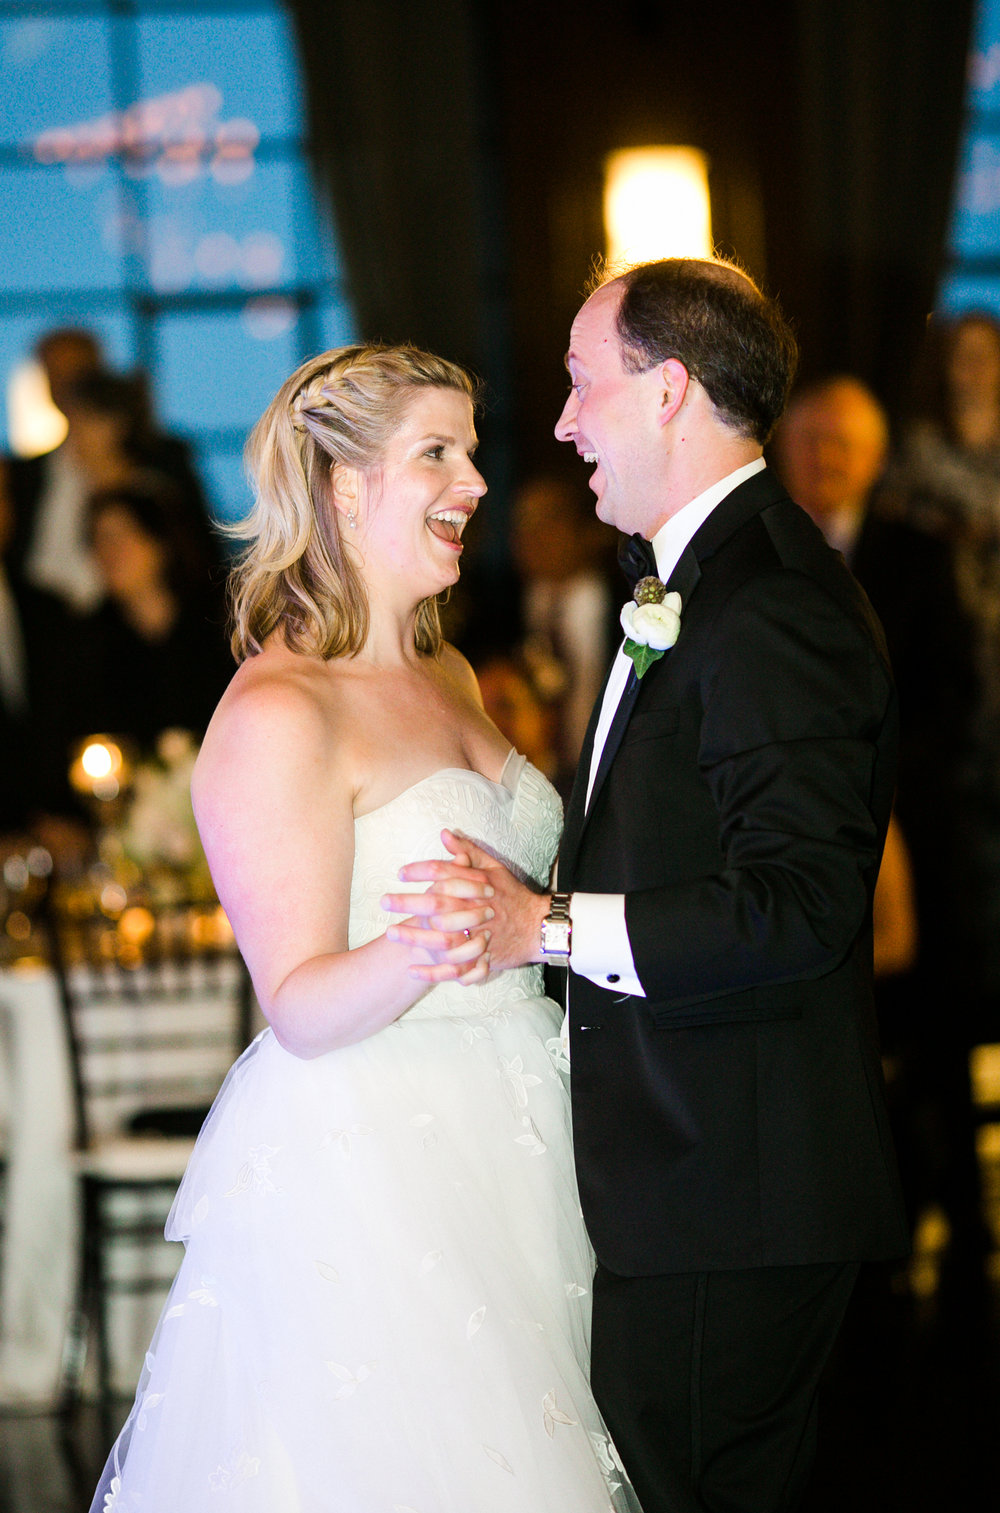 0043_St_Martin_Houston_Wedding_The_Astorian.jpg